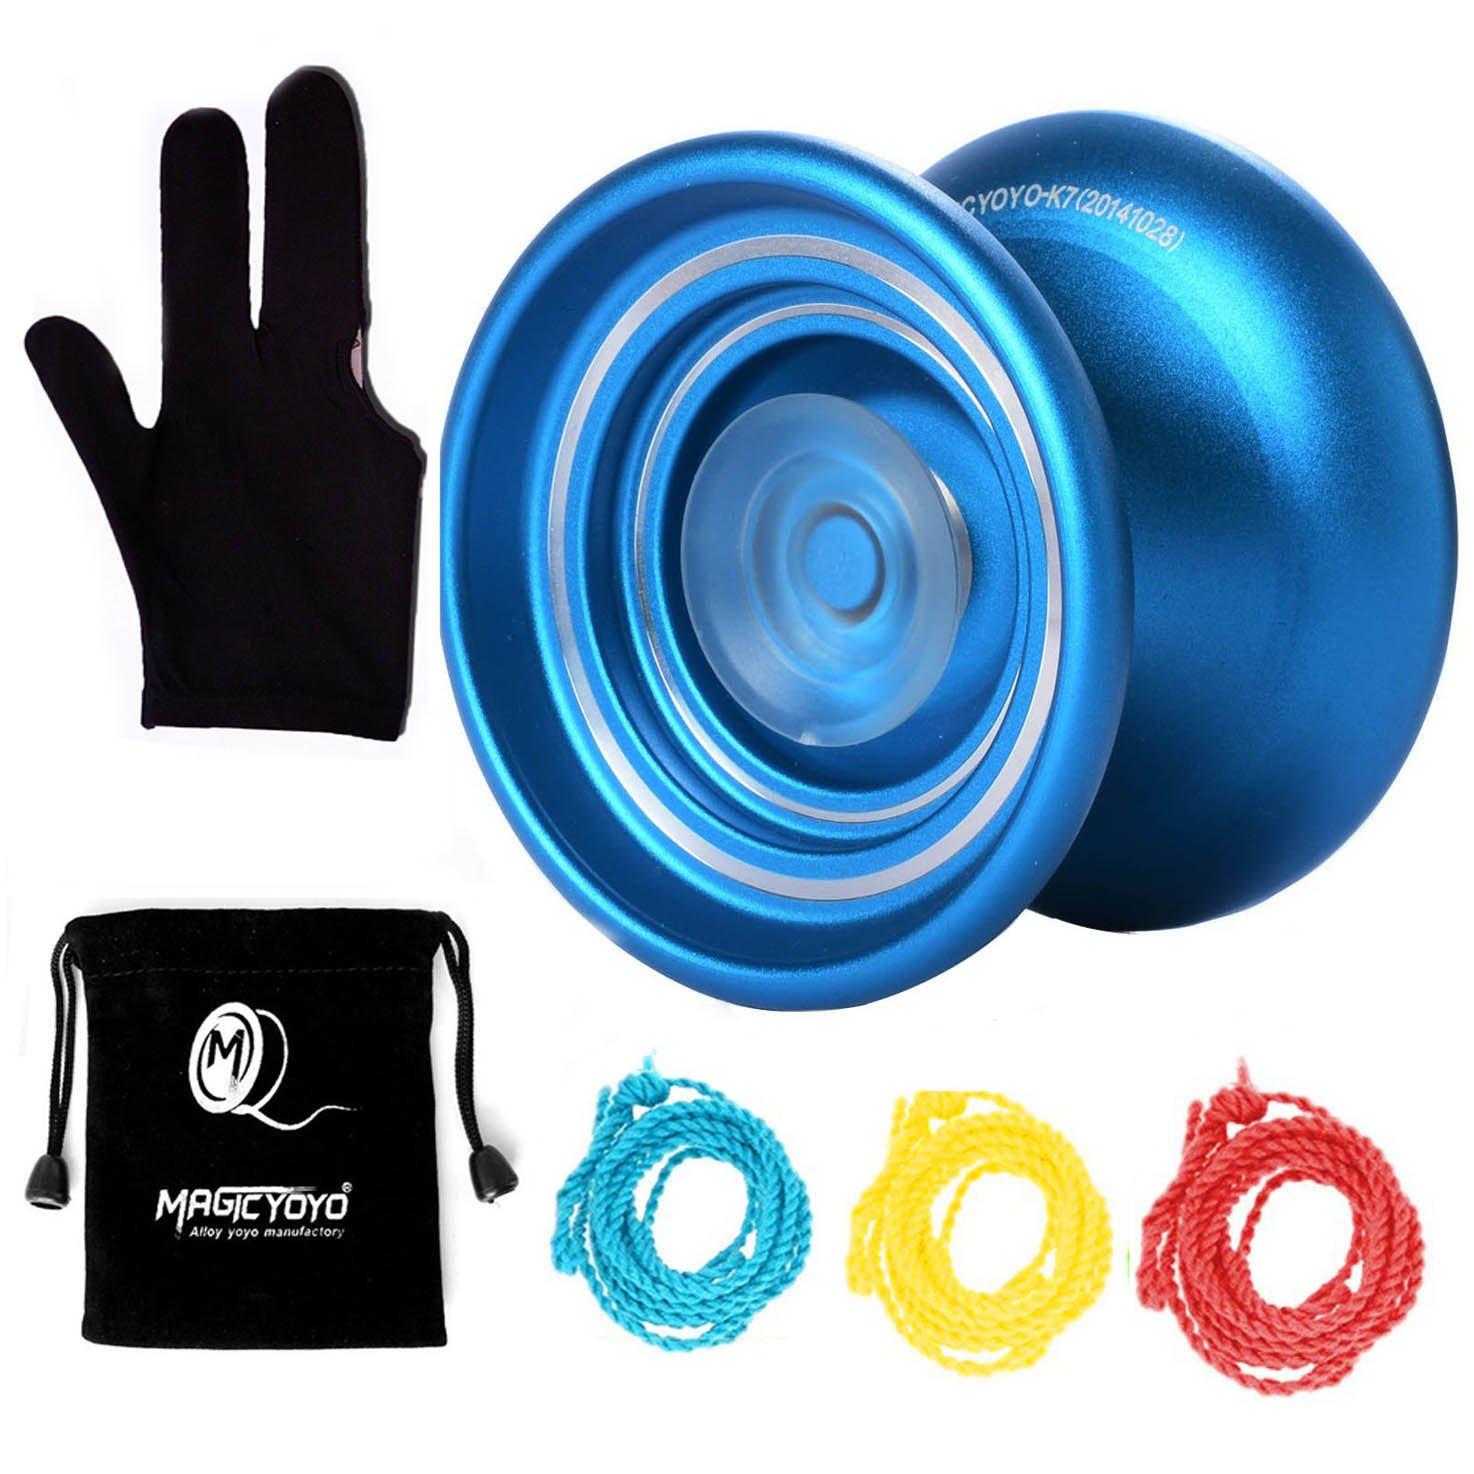 MAGICYOYO K7 Metal YoYo Responsive Alloy Yoyo Blue Kids Beginners Glove+3 Strings +YoYo Sack